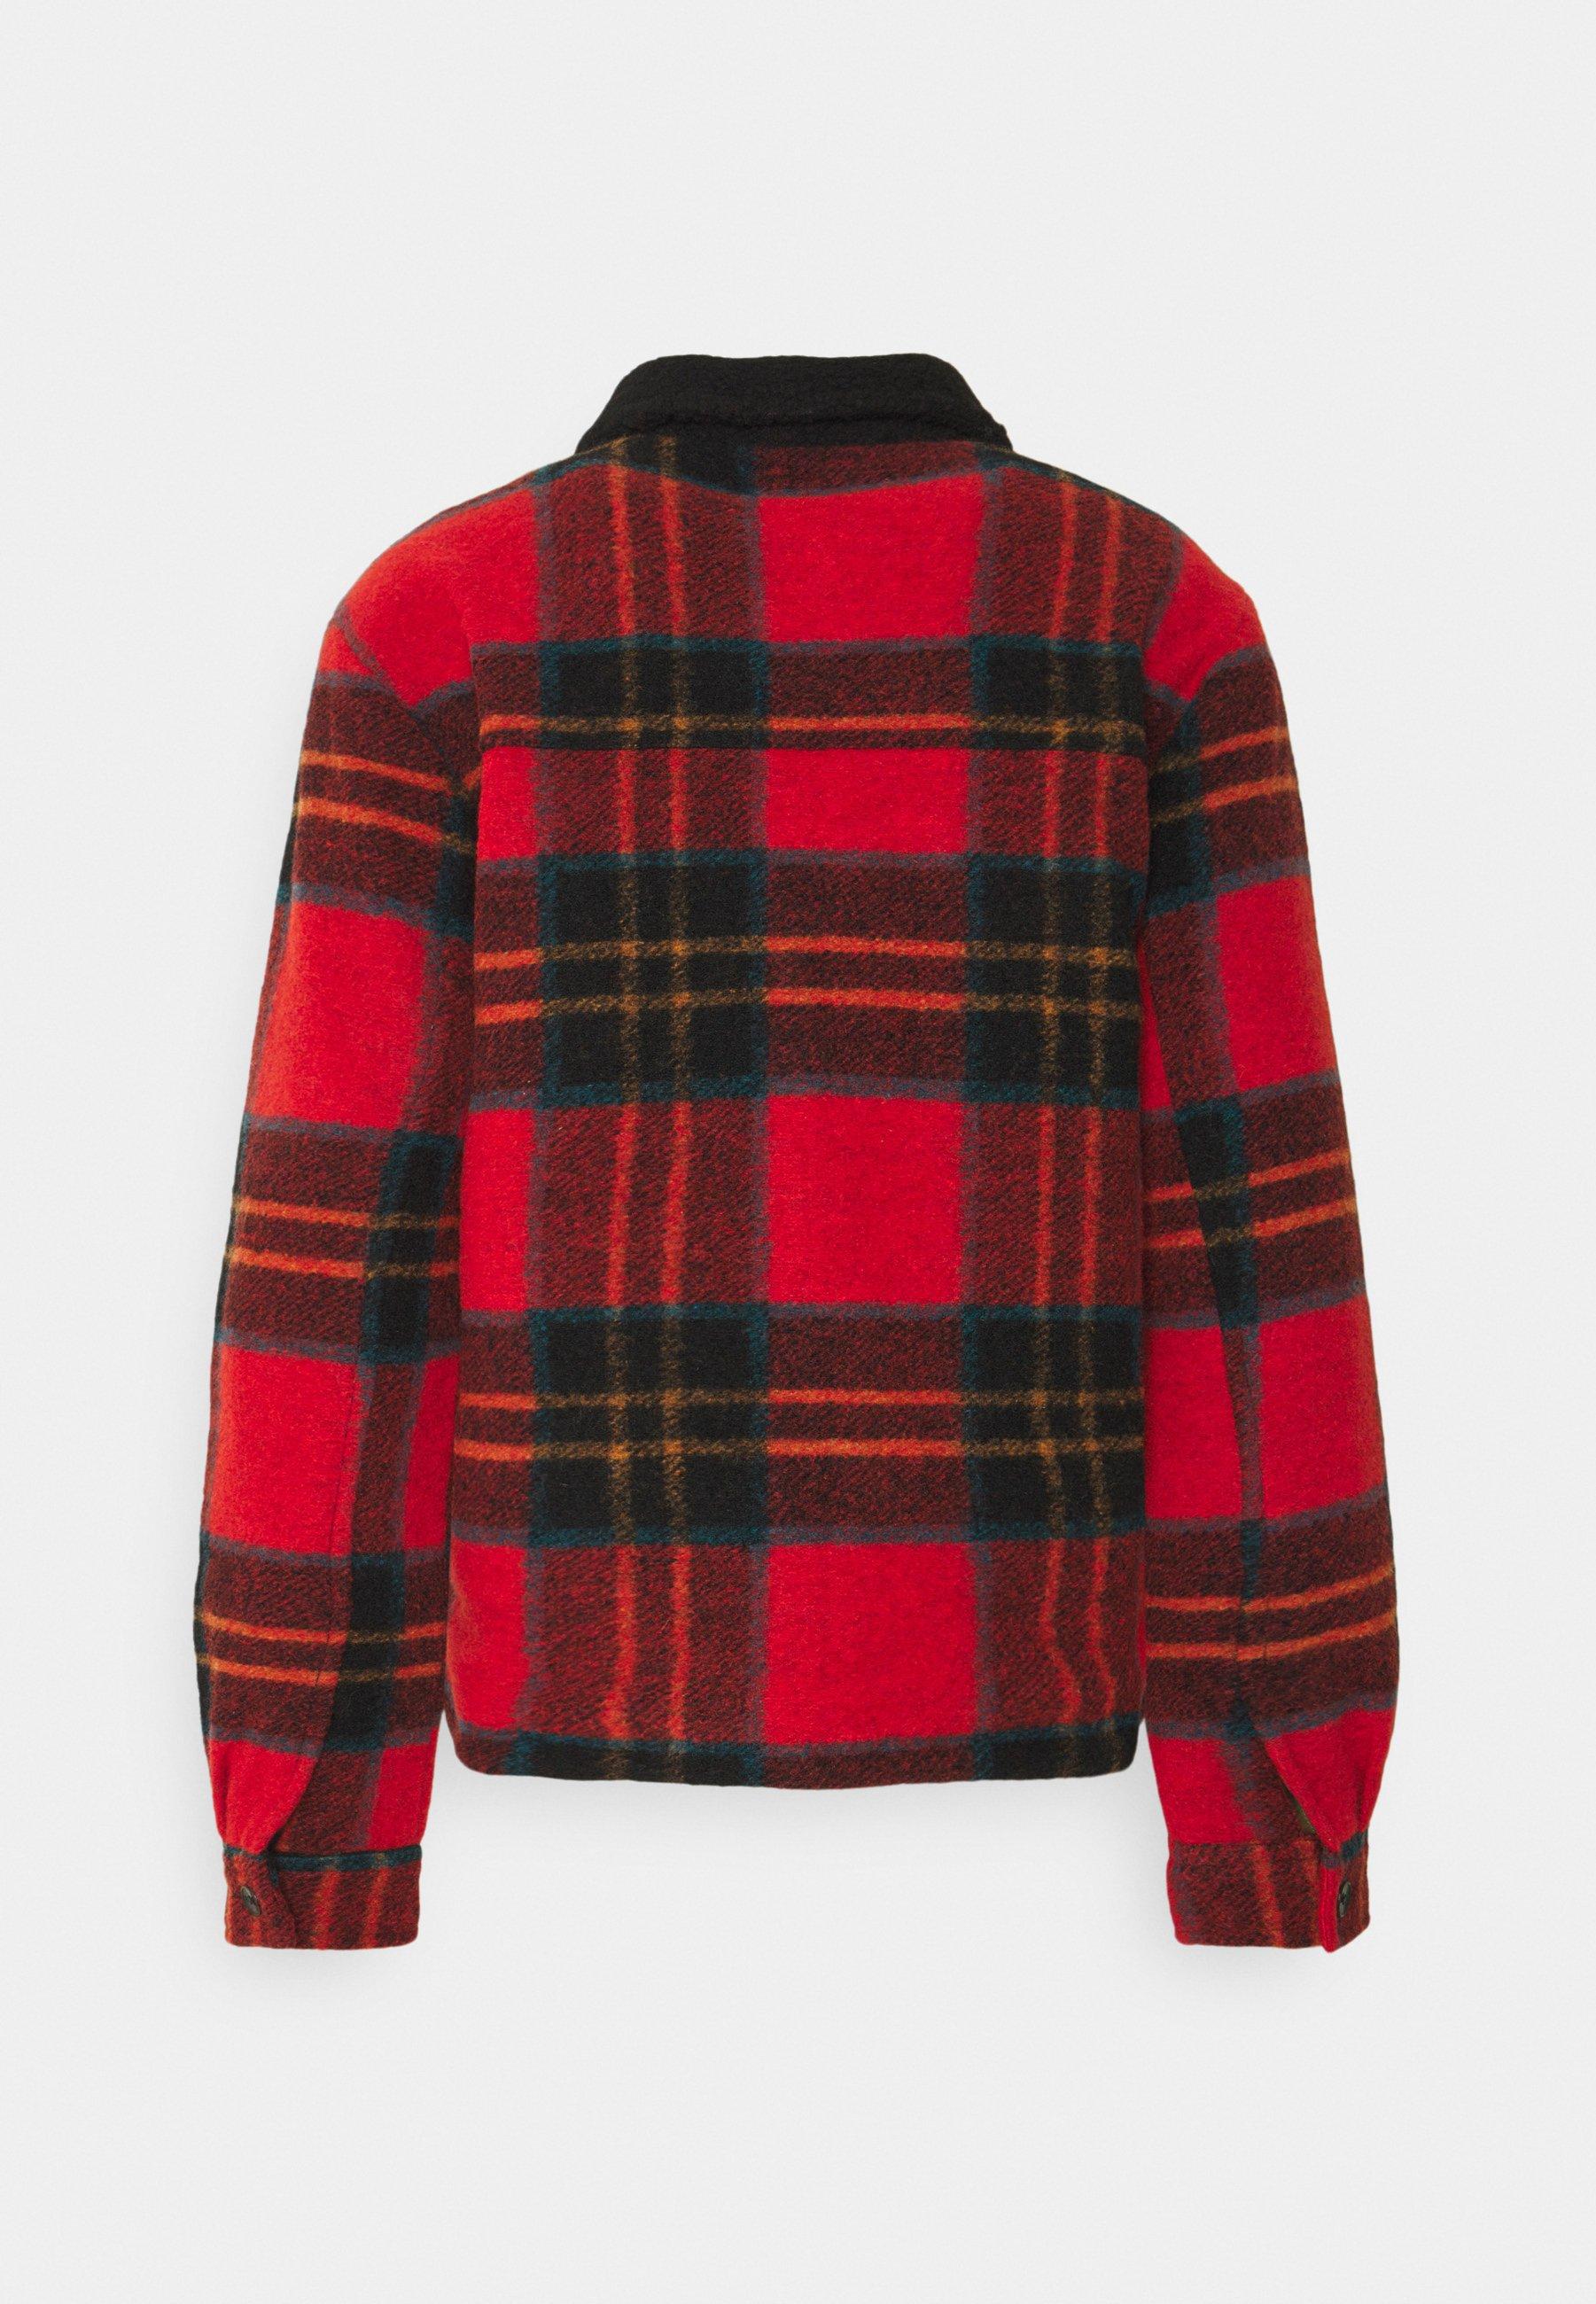 Men TARTAN CHECK JACKET WITH TEDDY COLLAR - Light jacket